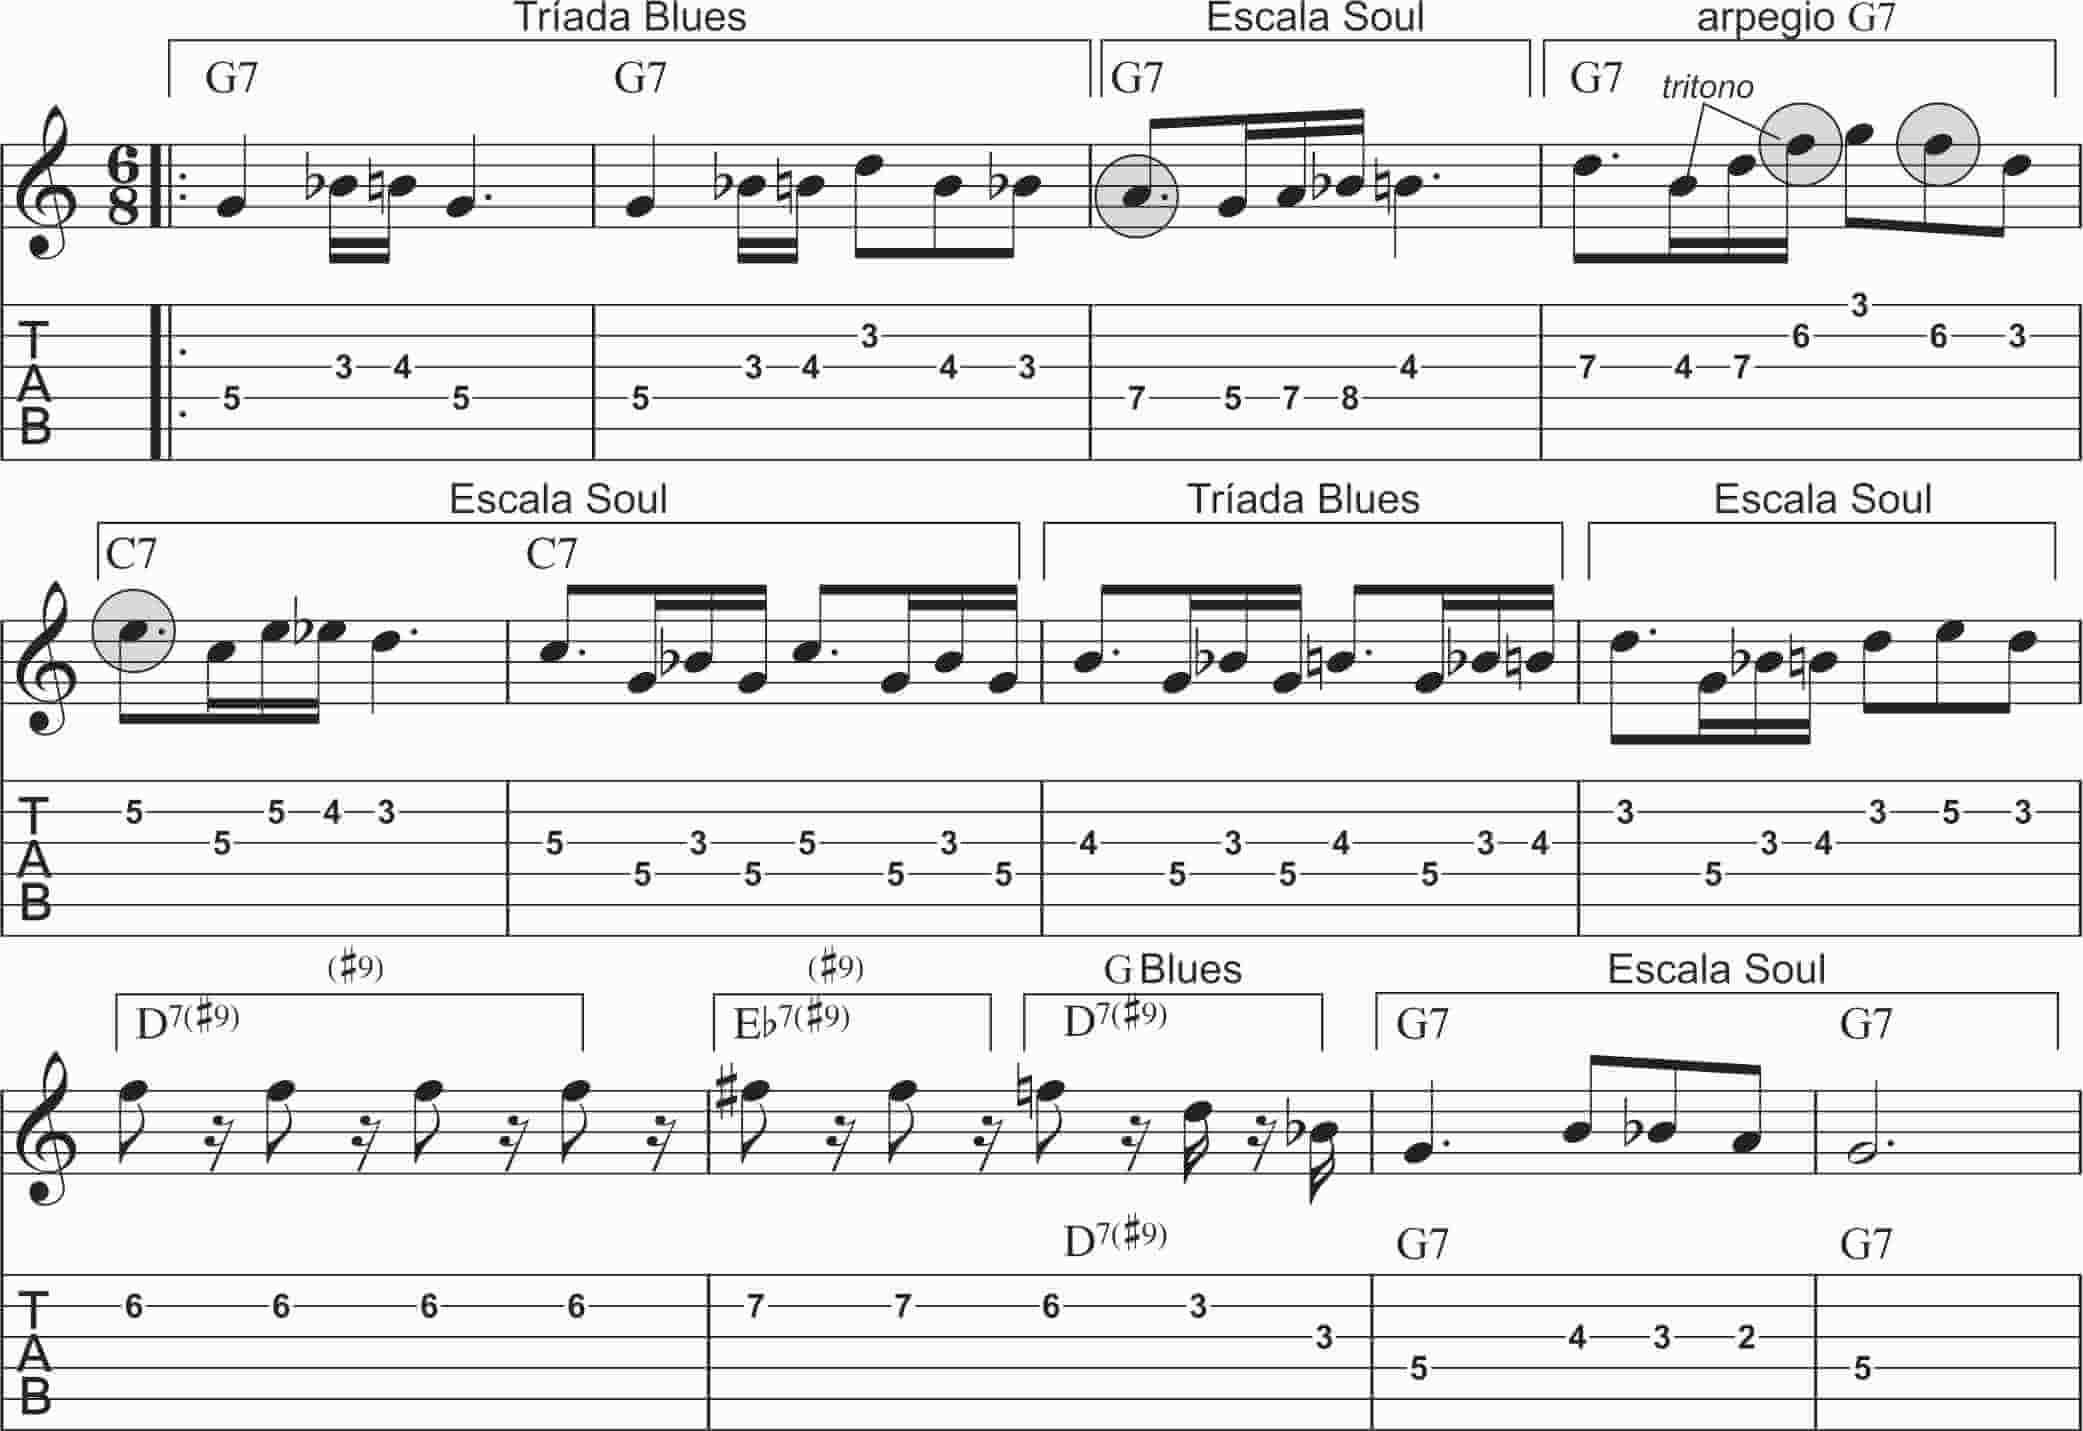 Mixolidias y Jazz